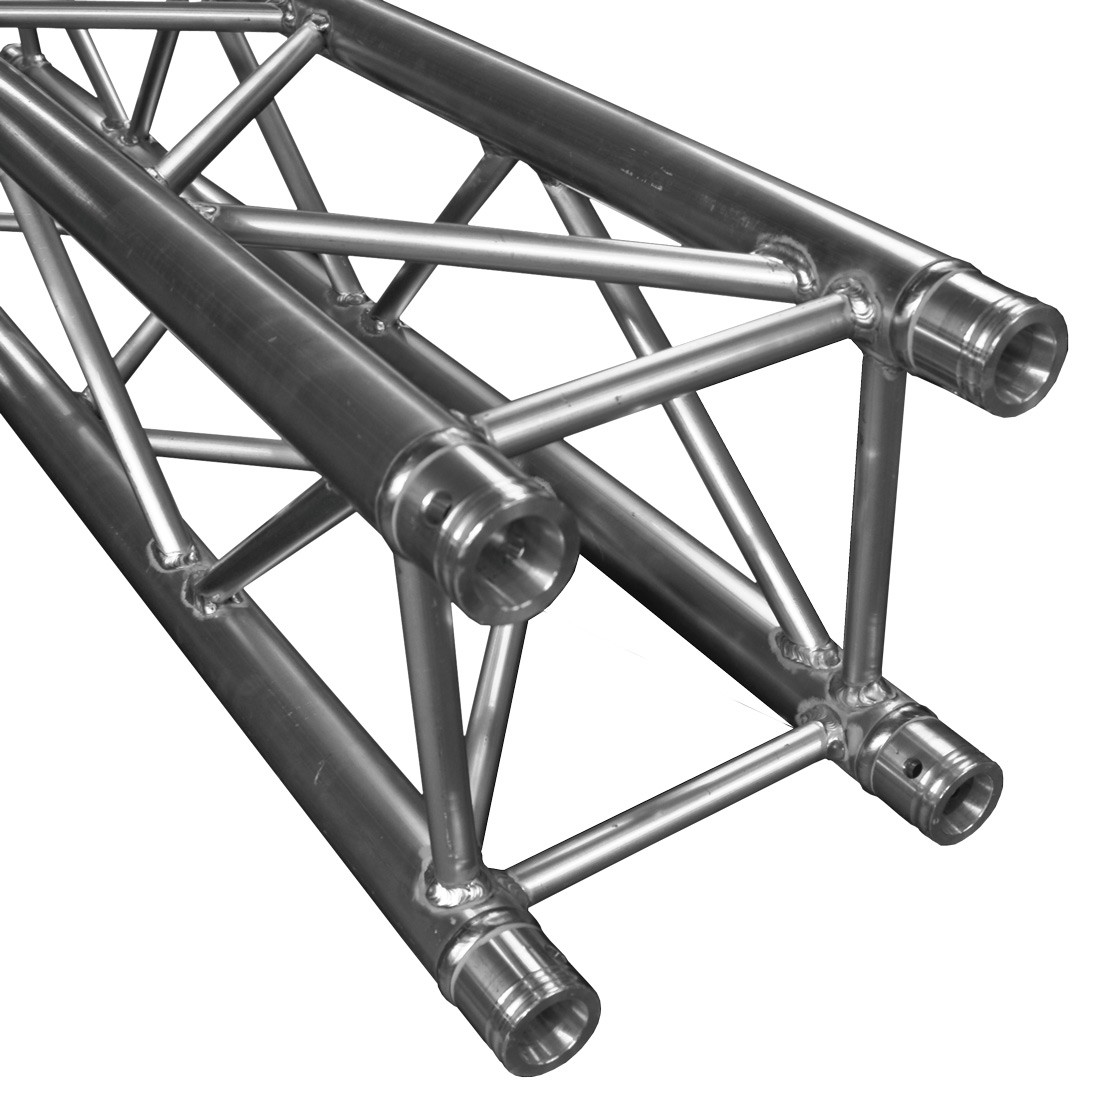 Hliníkové konštrukcie a clampy